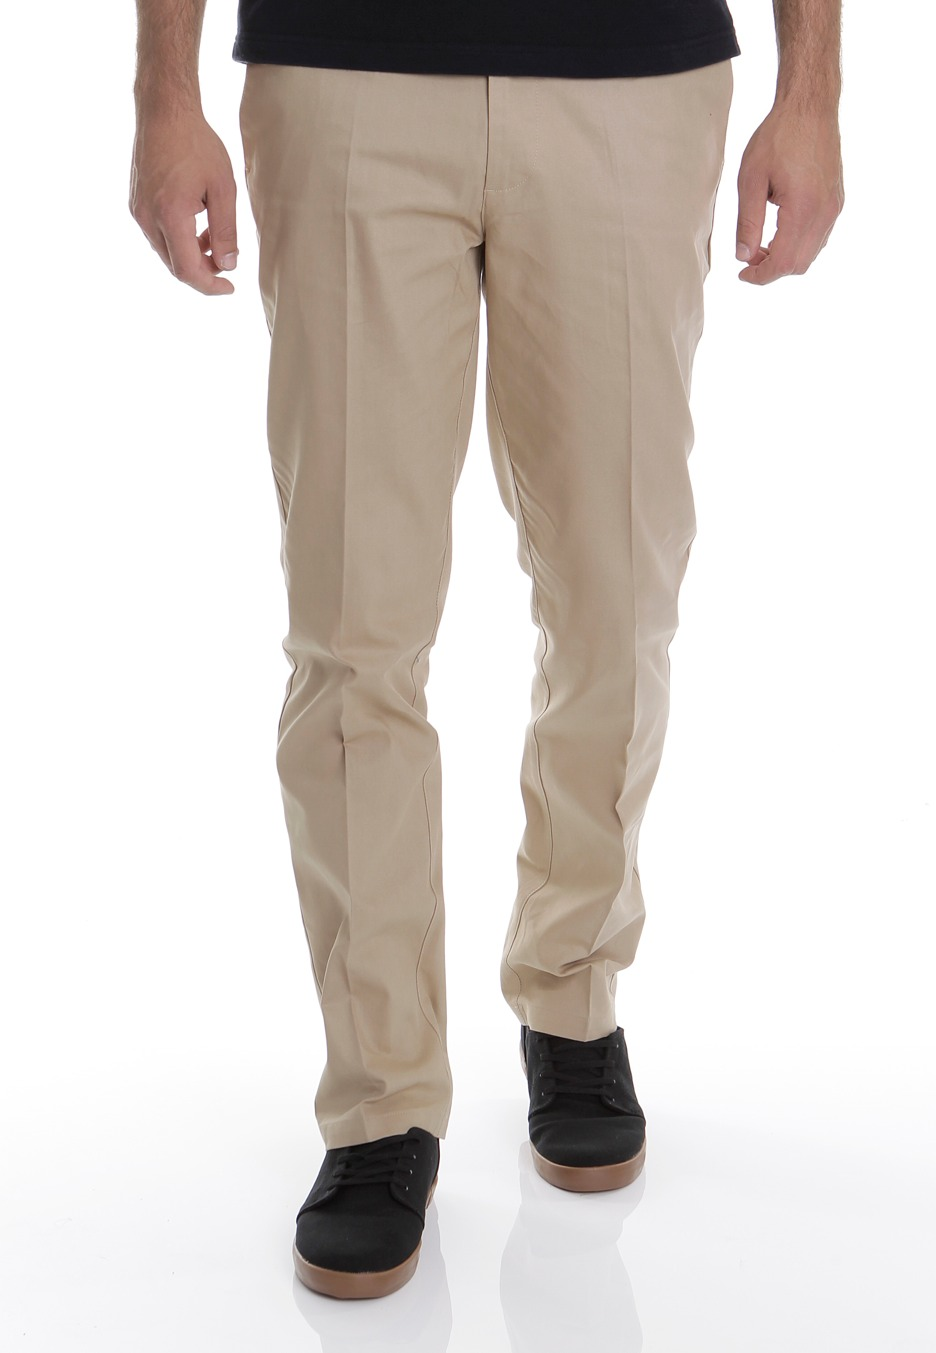 Chino Khaki Pants